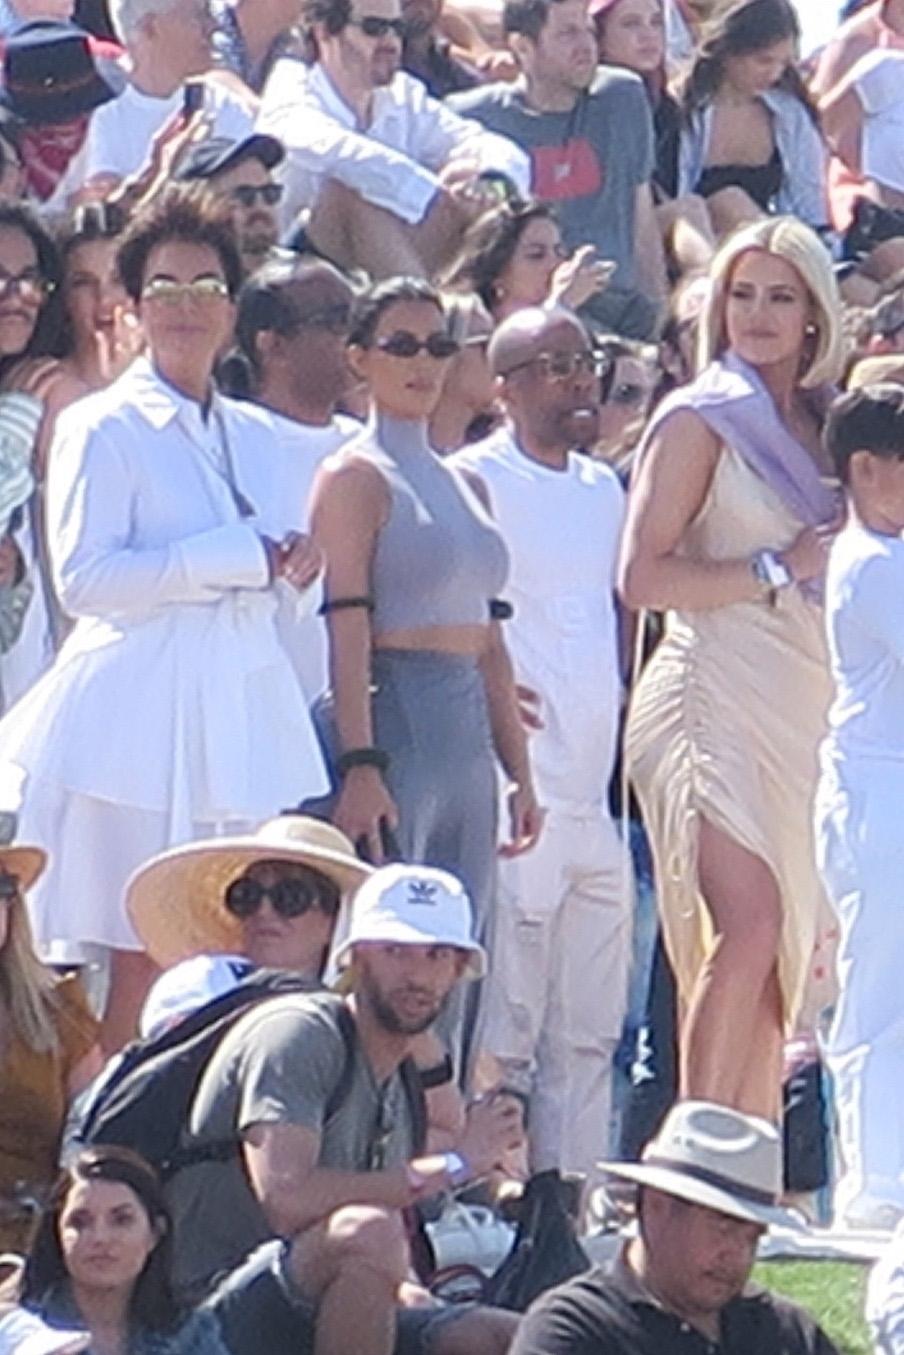 Kris Jenner, Kim Kardashian and Khloe Kardashian attend Kanye West's Coachella Easter church service in Indio, California, on April 21, 2019.